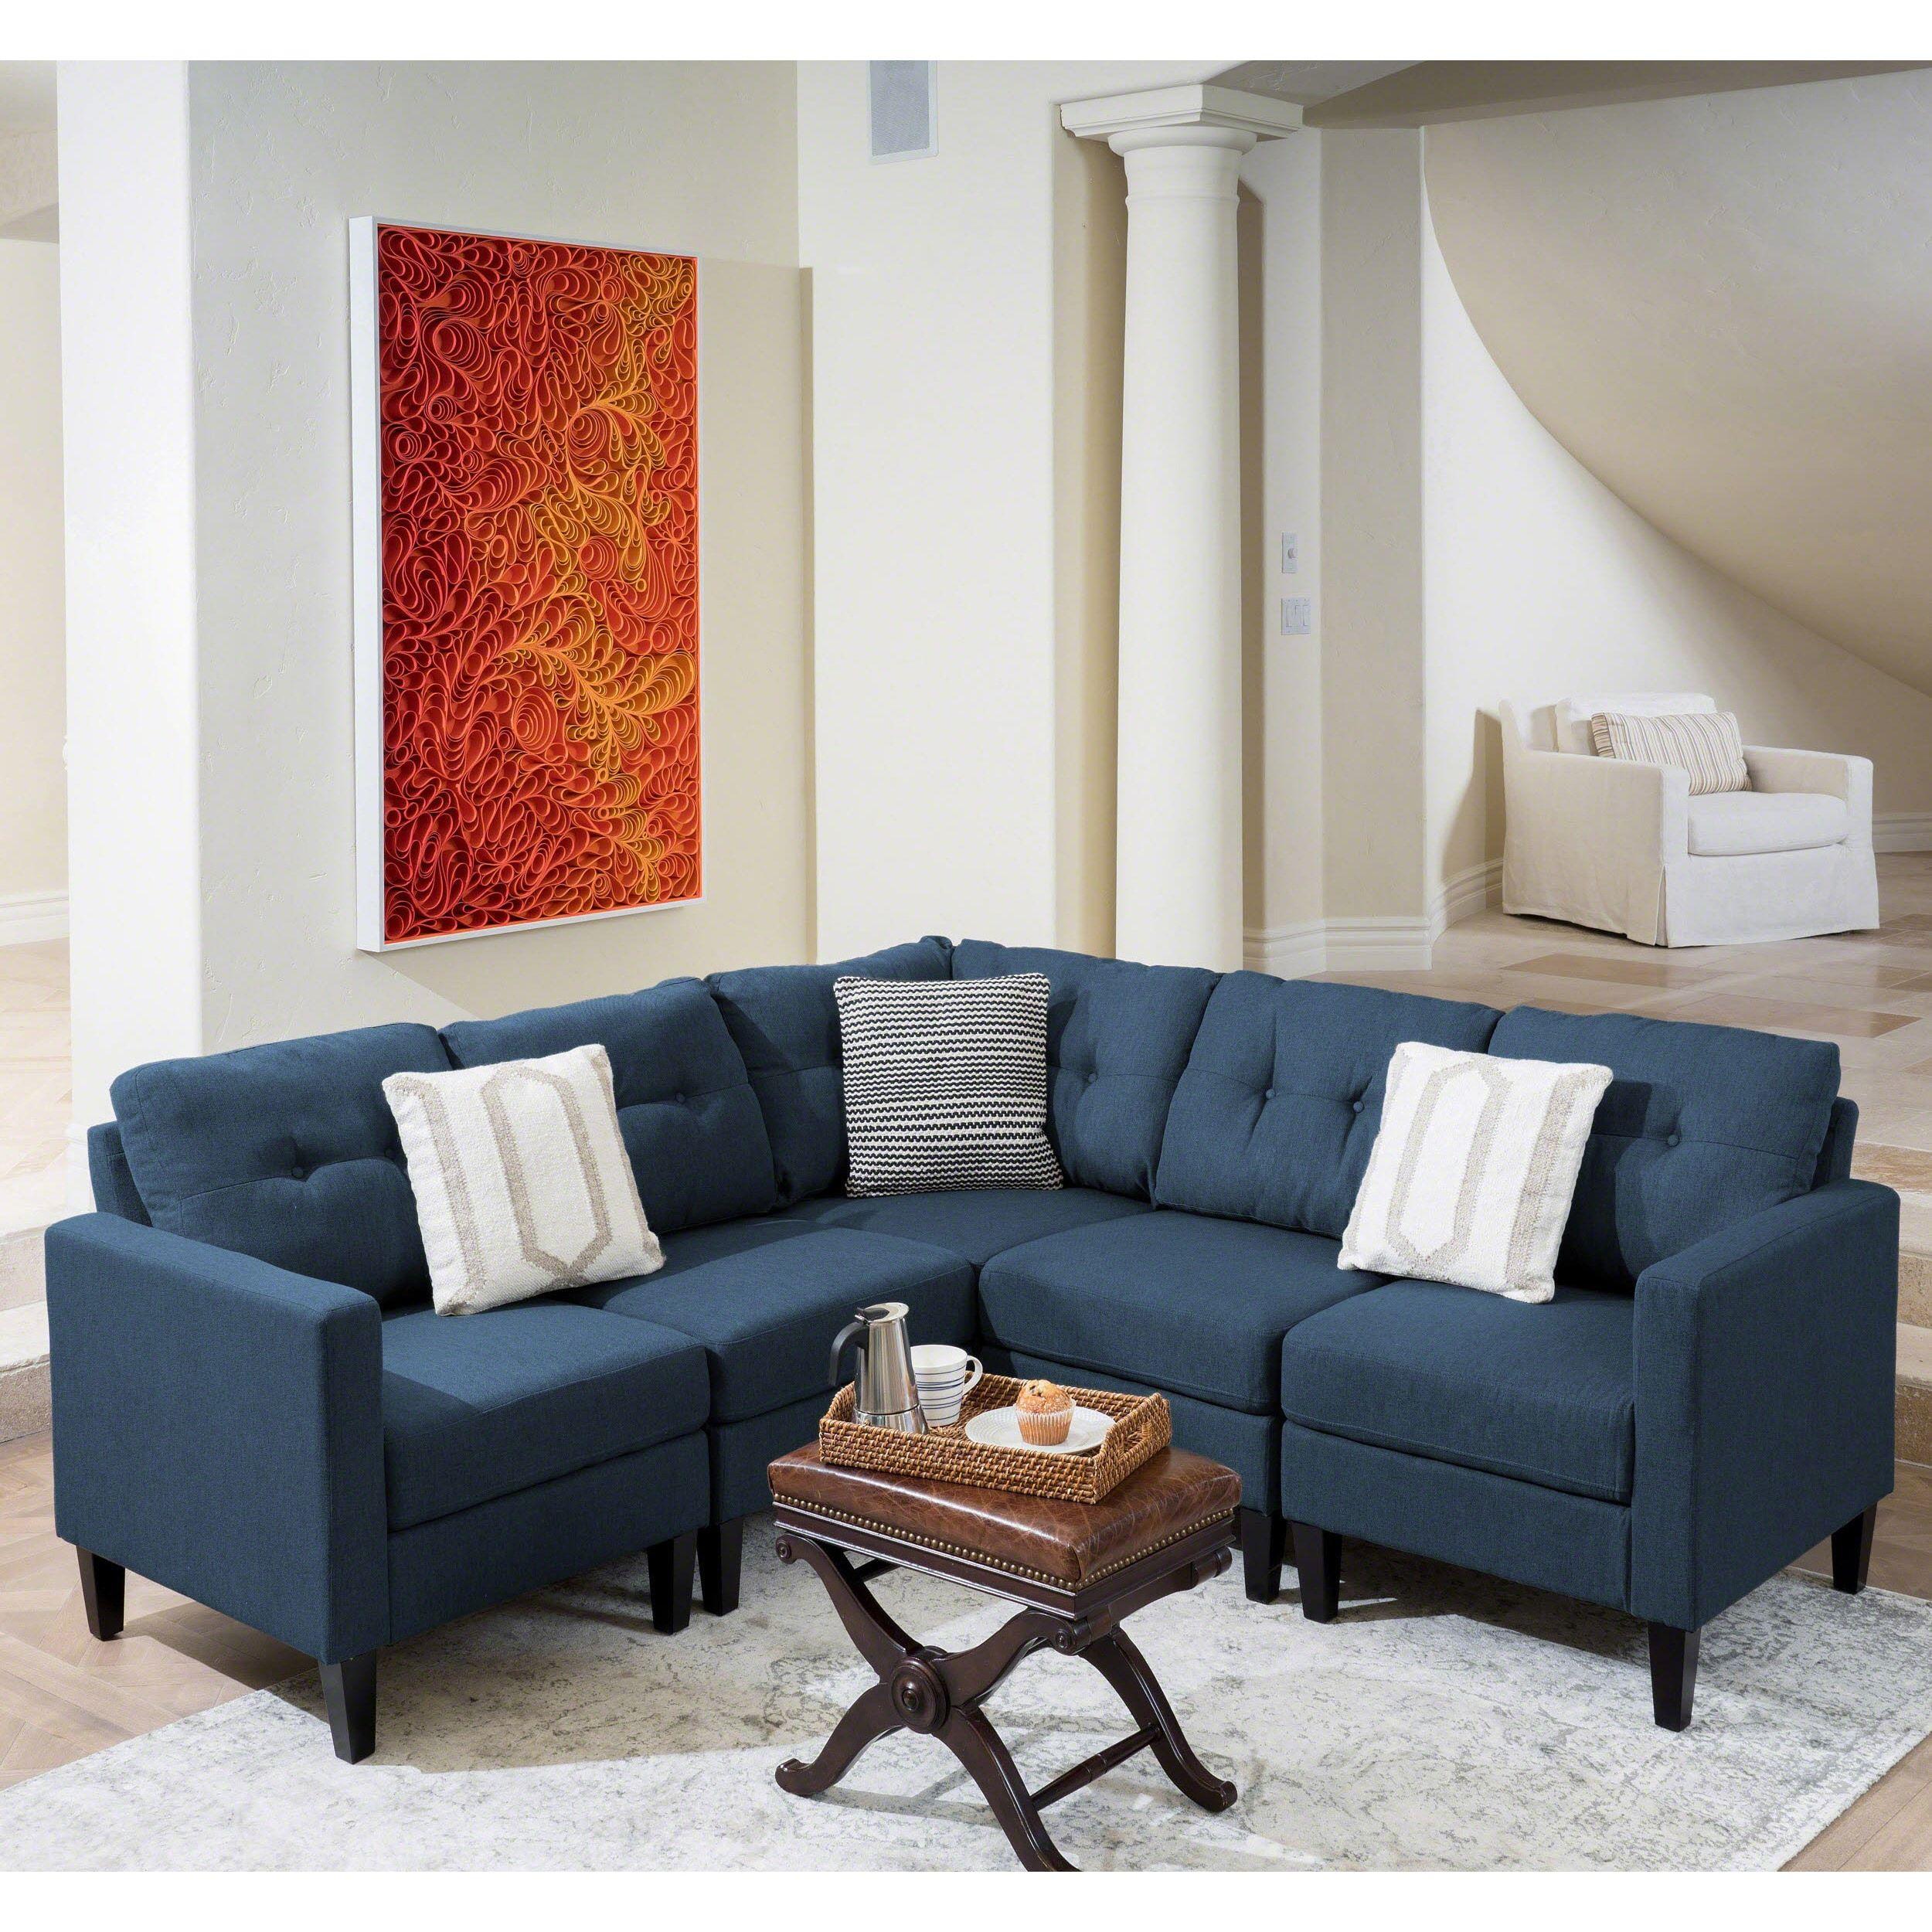 Brilliant Emmie Mid Century Modern 5 Piece Sectional Sofa Set By Unemploymentrelief Wooden Chair Designs For Living Room Unemploymentrelieforg